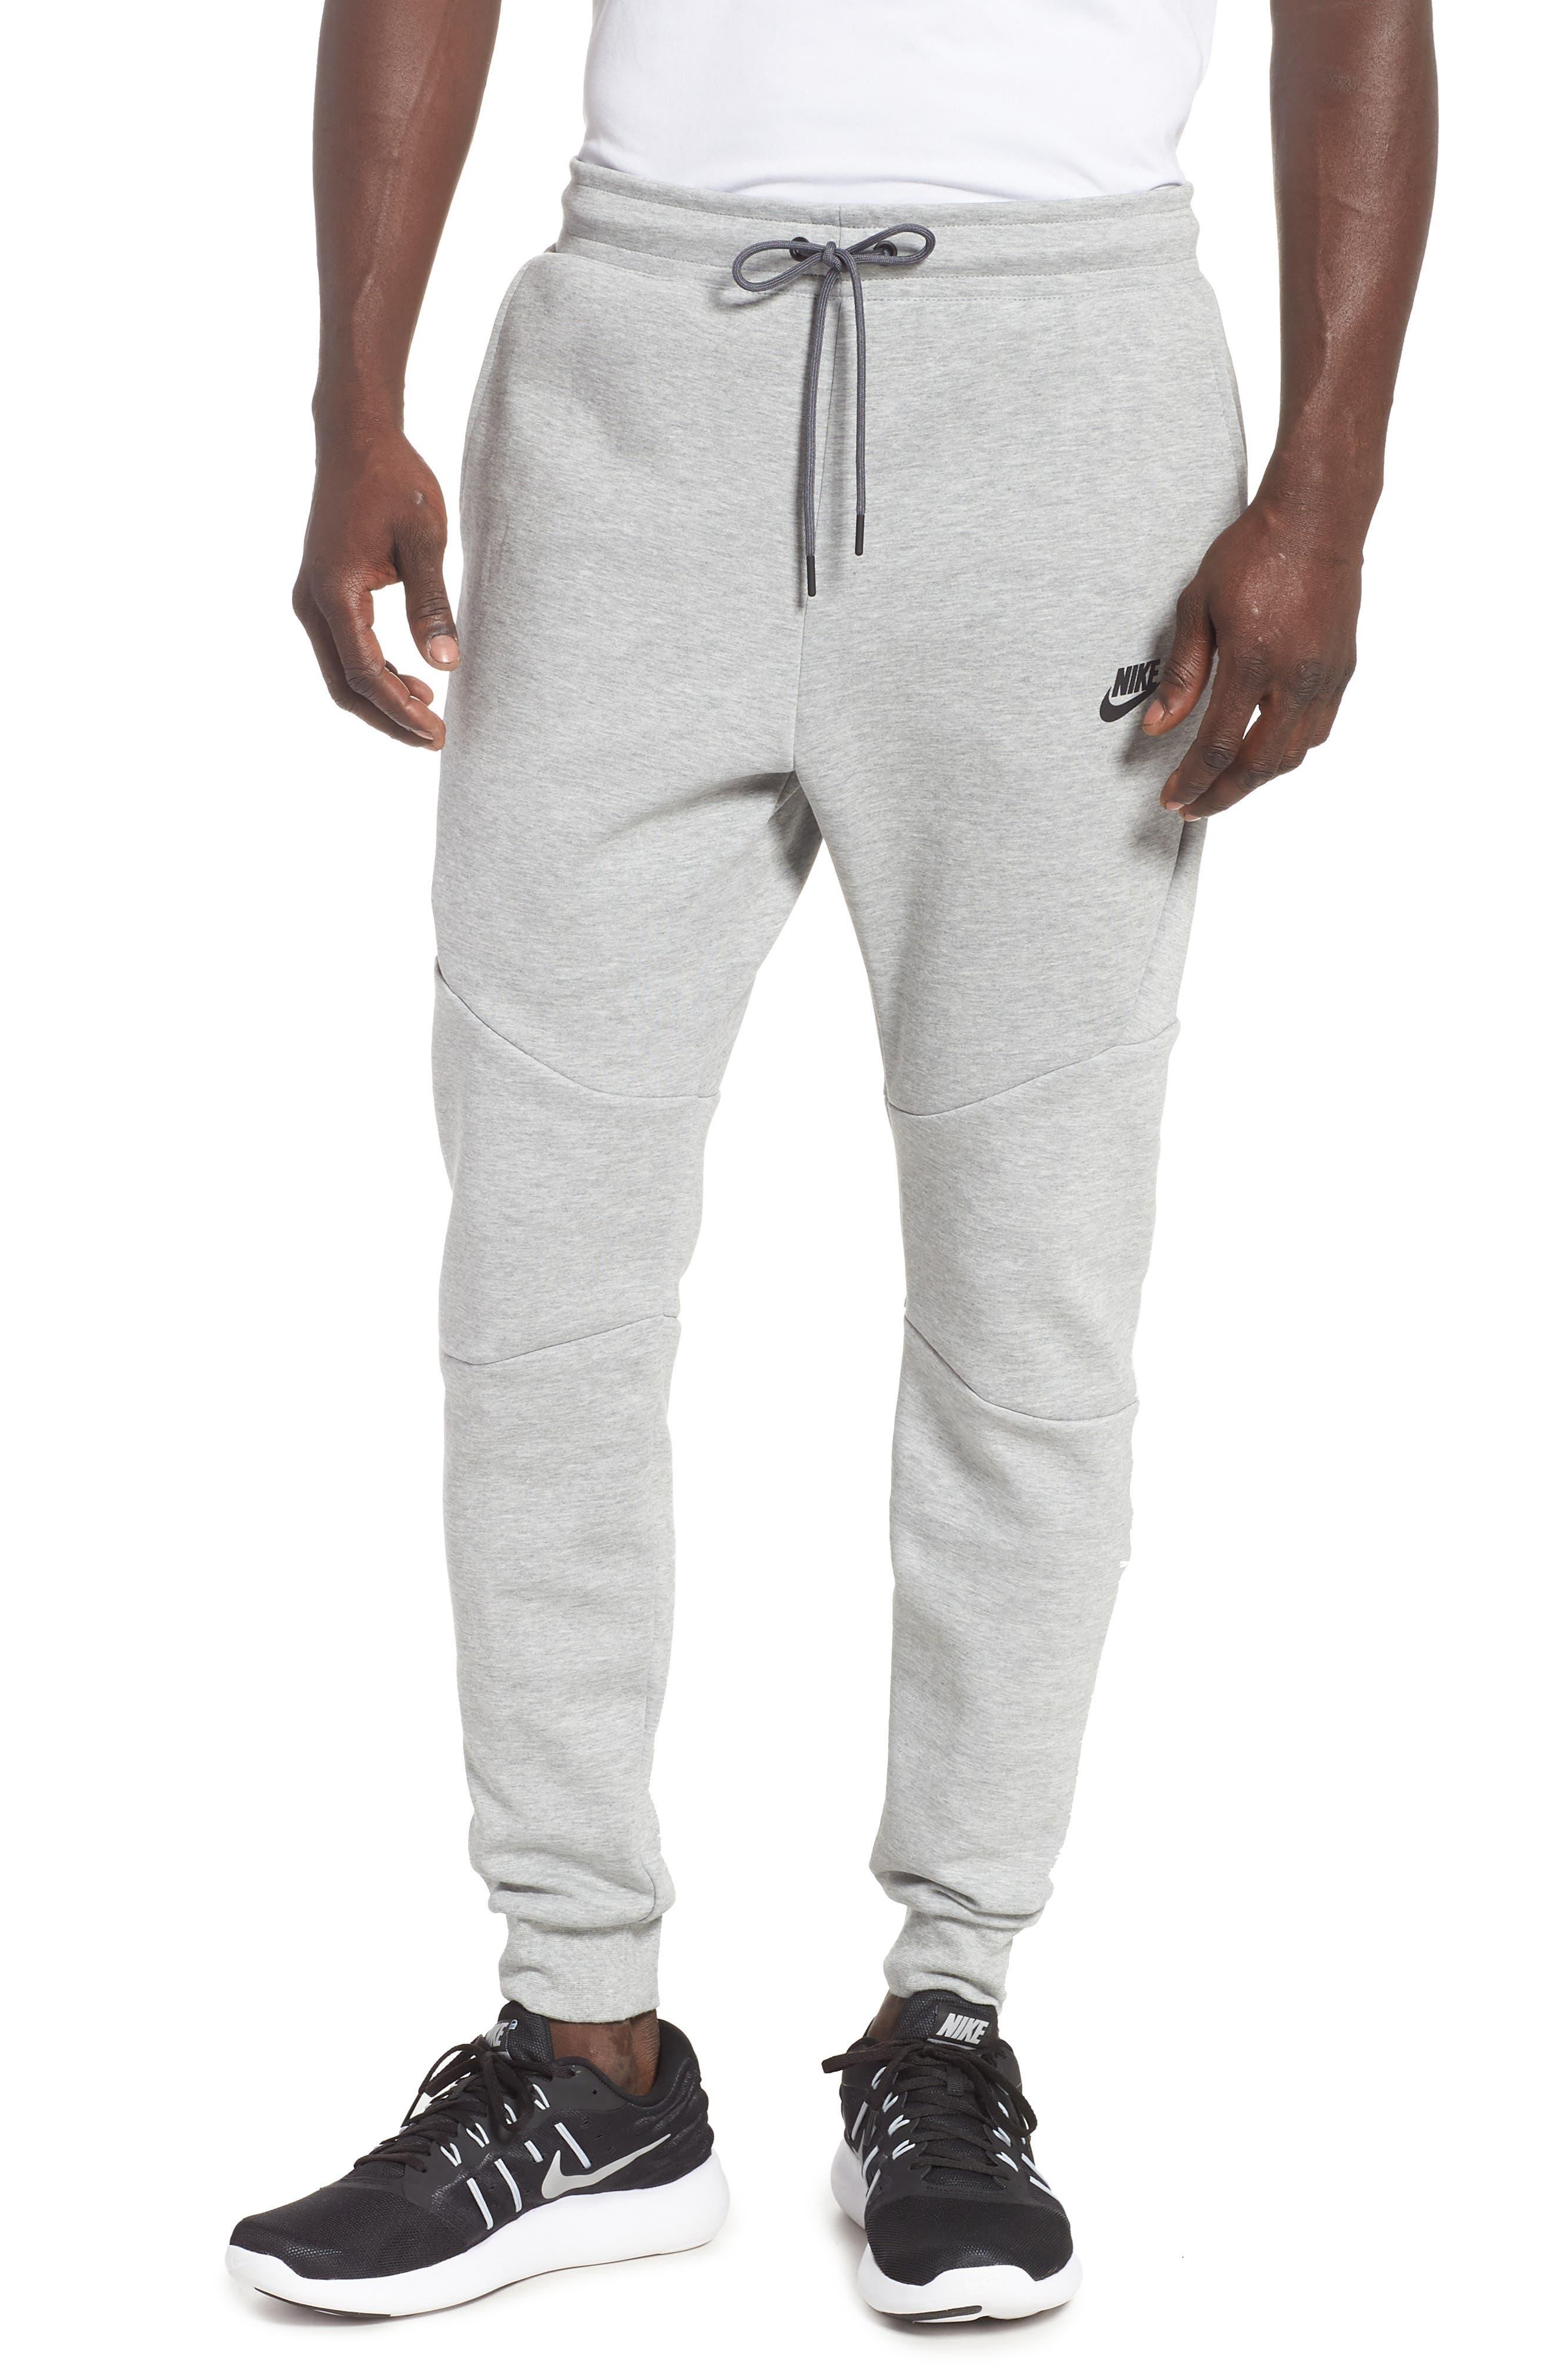 Tech Fleece Jogger Pants by Nike